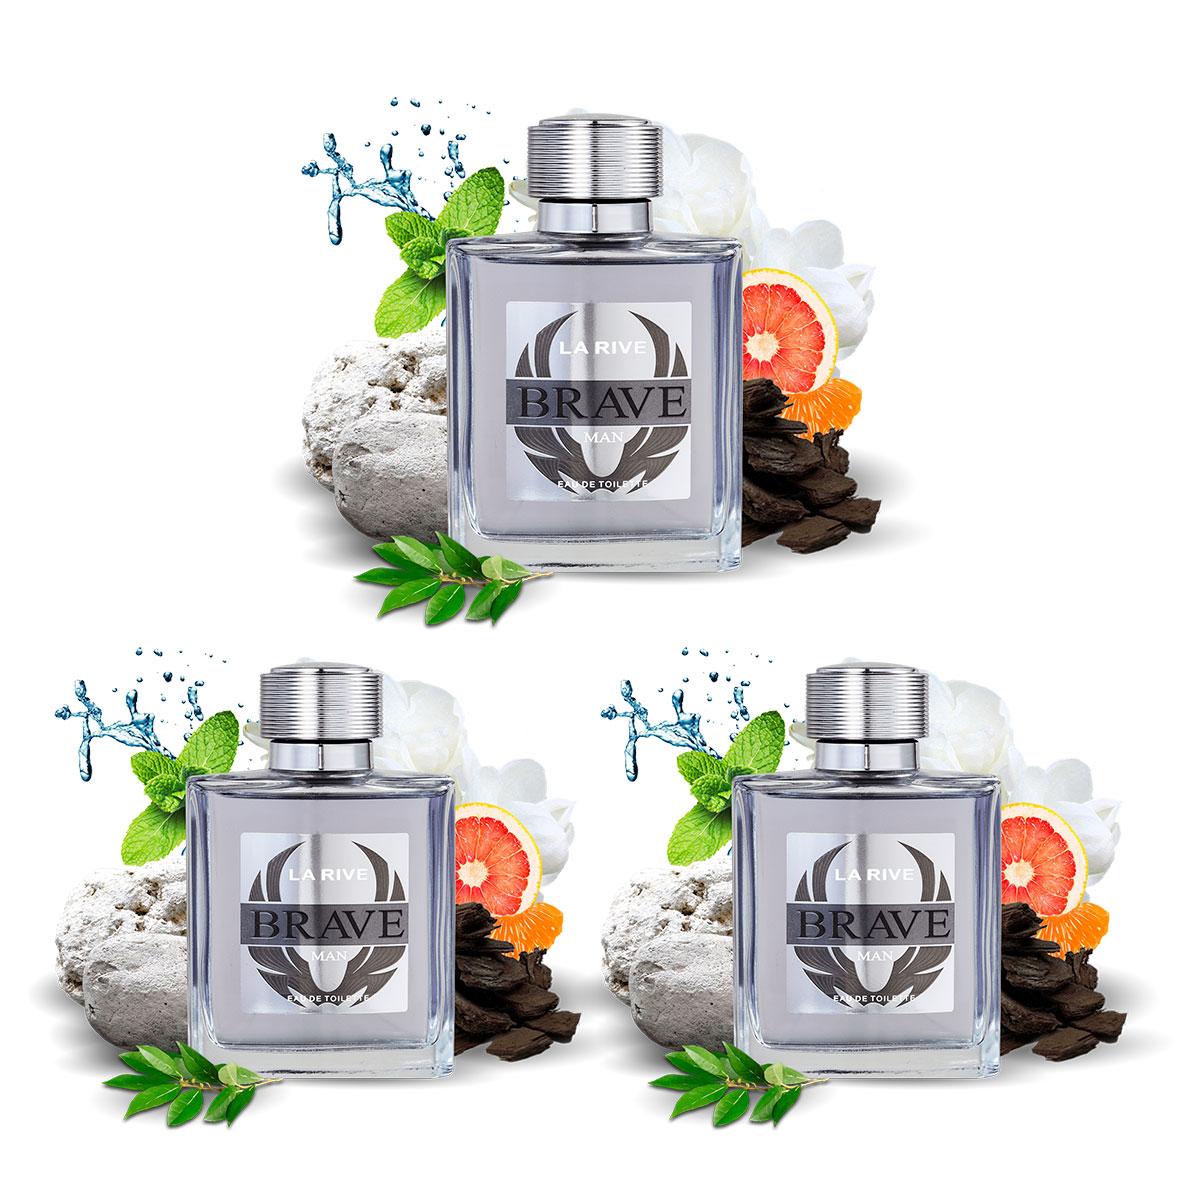 Kit 3 Perfumes Importados Masculinos Brave La Rive